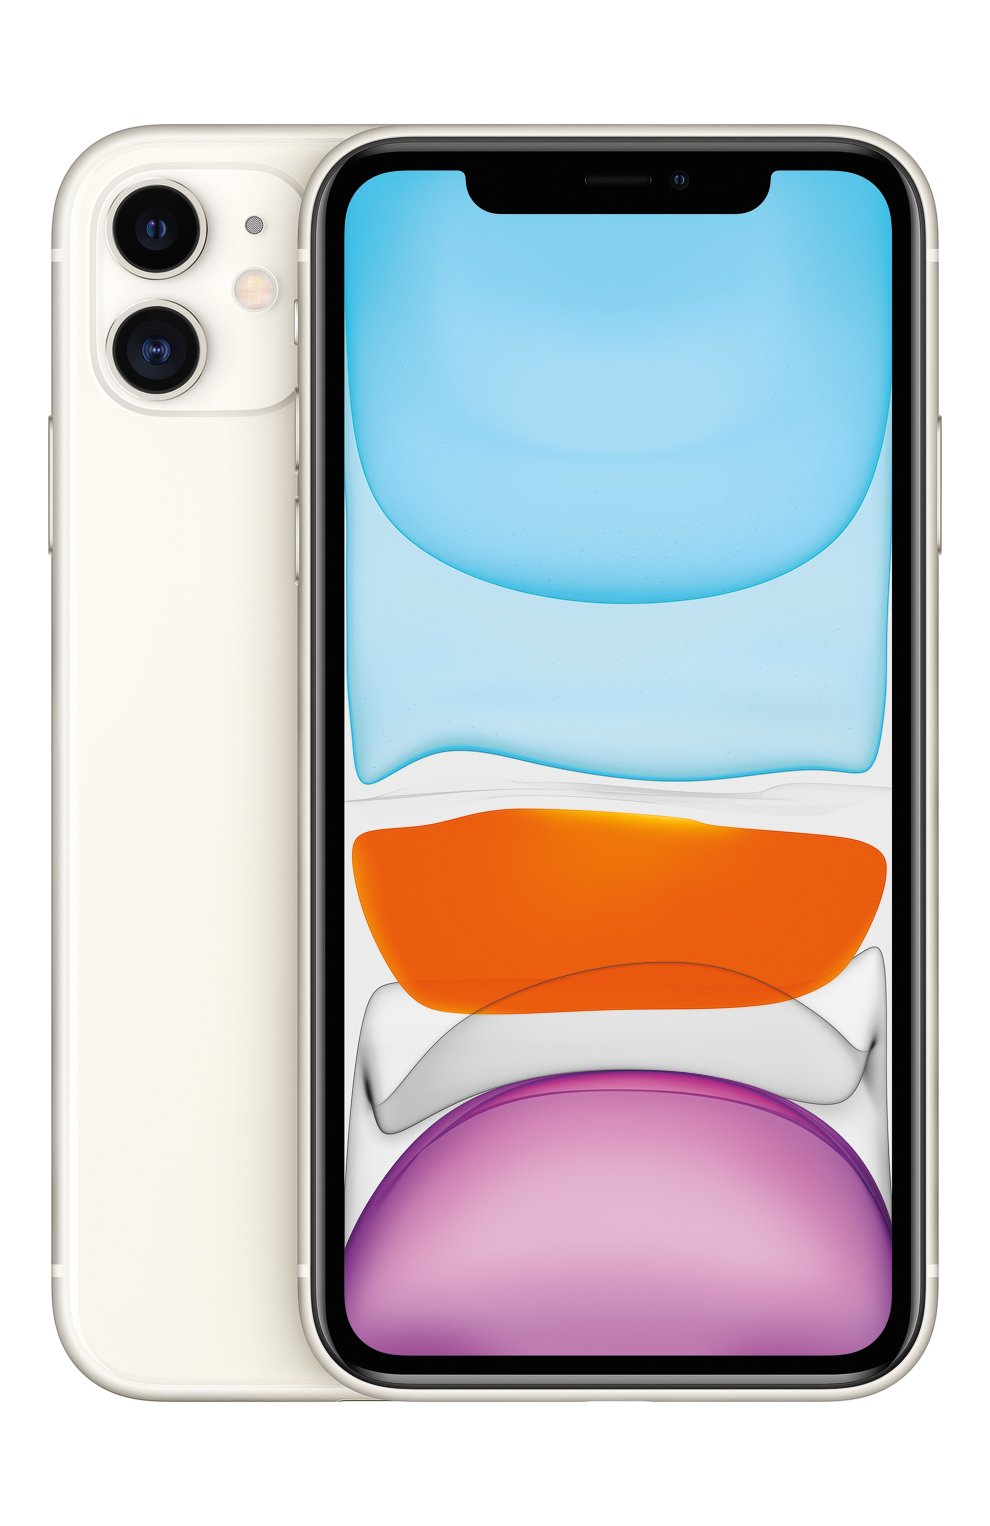 Мужской iphone 11 128gb white APPLE  white цвета, арт. MWM22RU/A | Фото 2